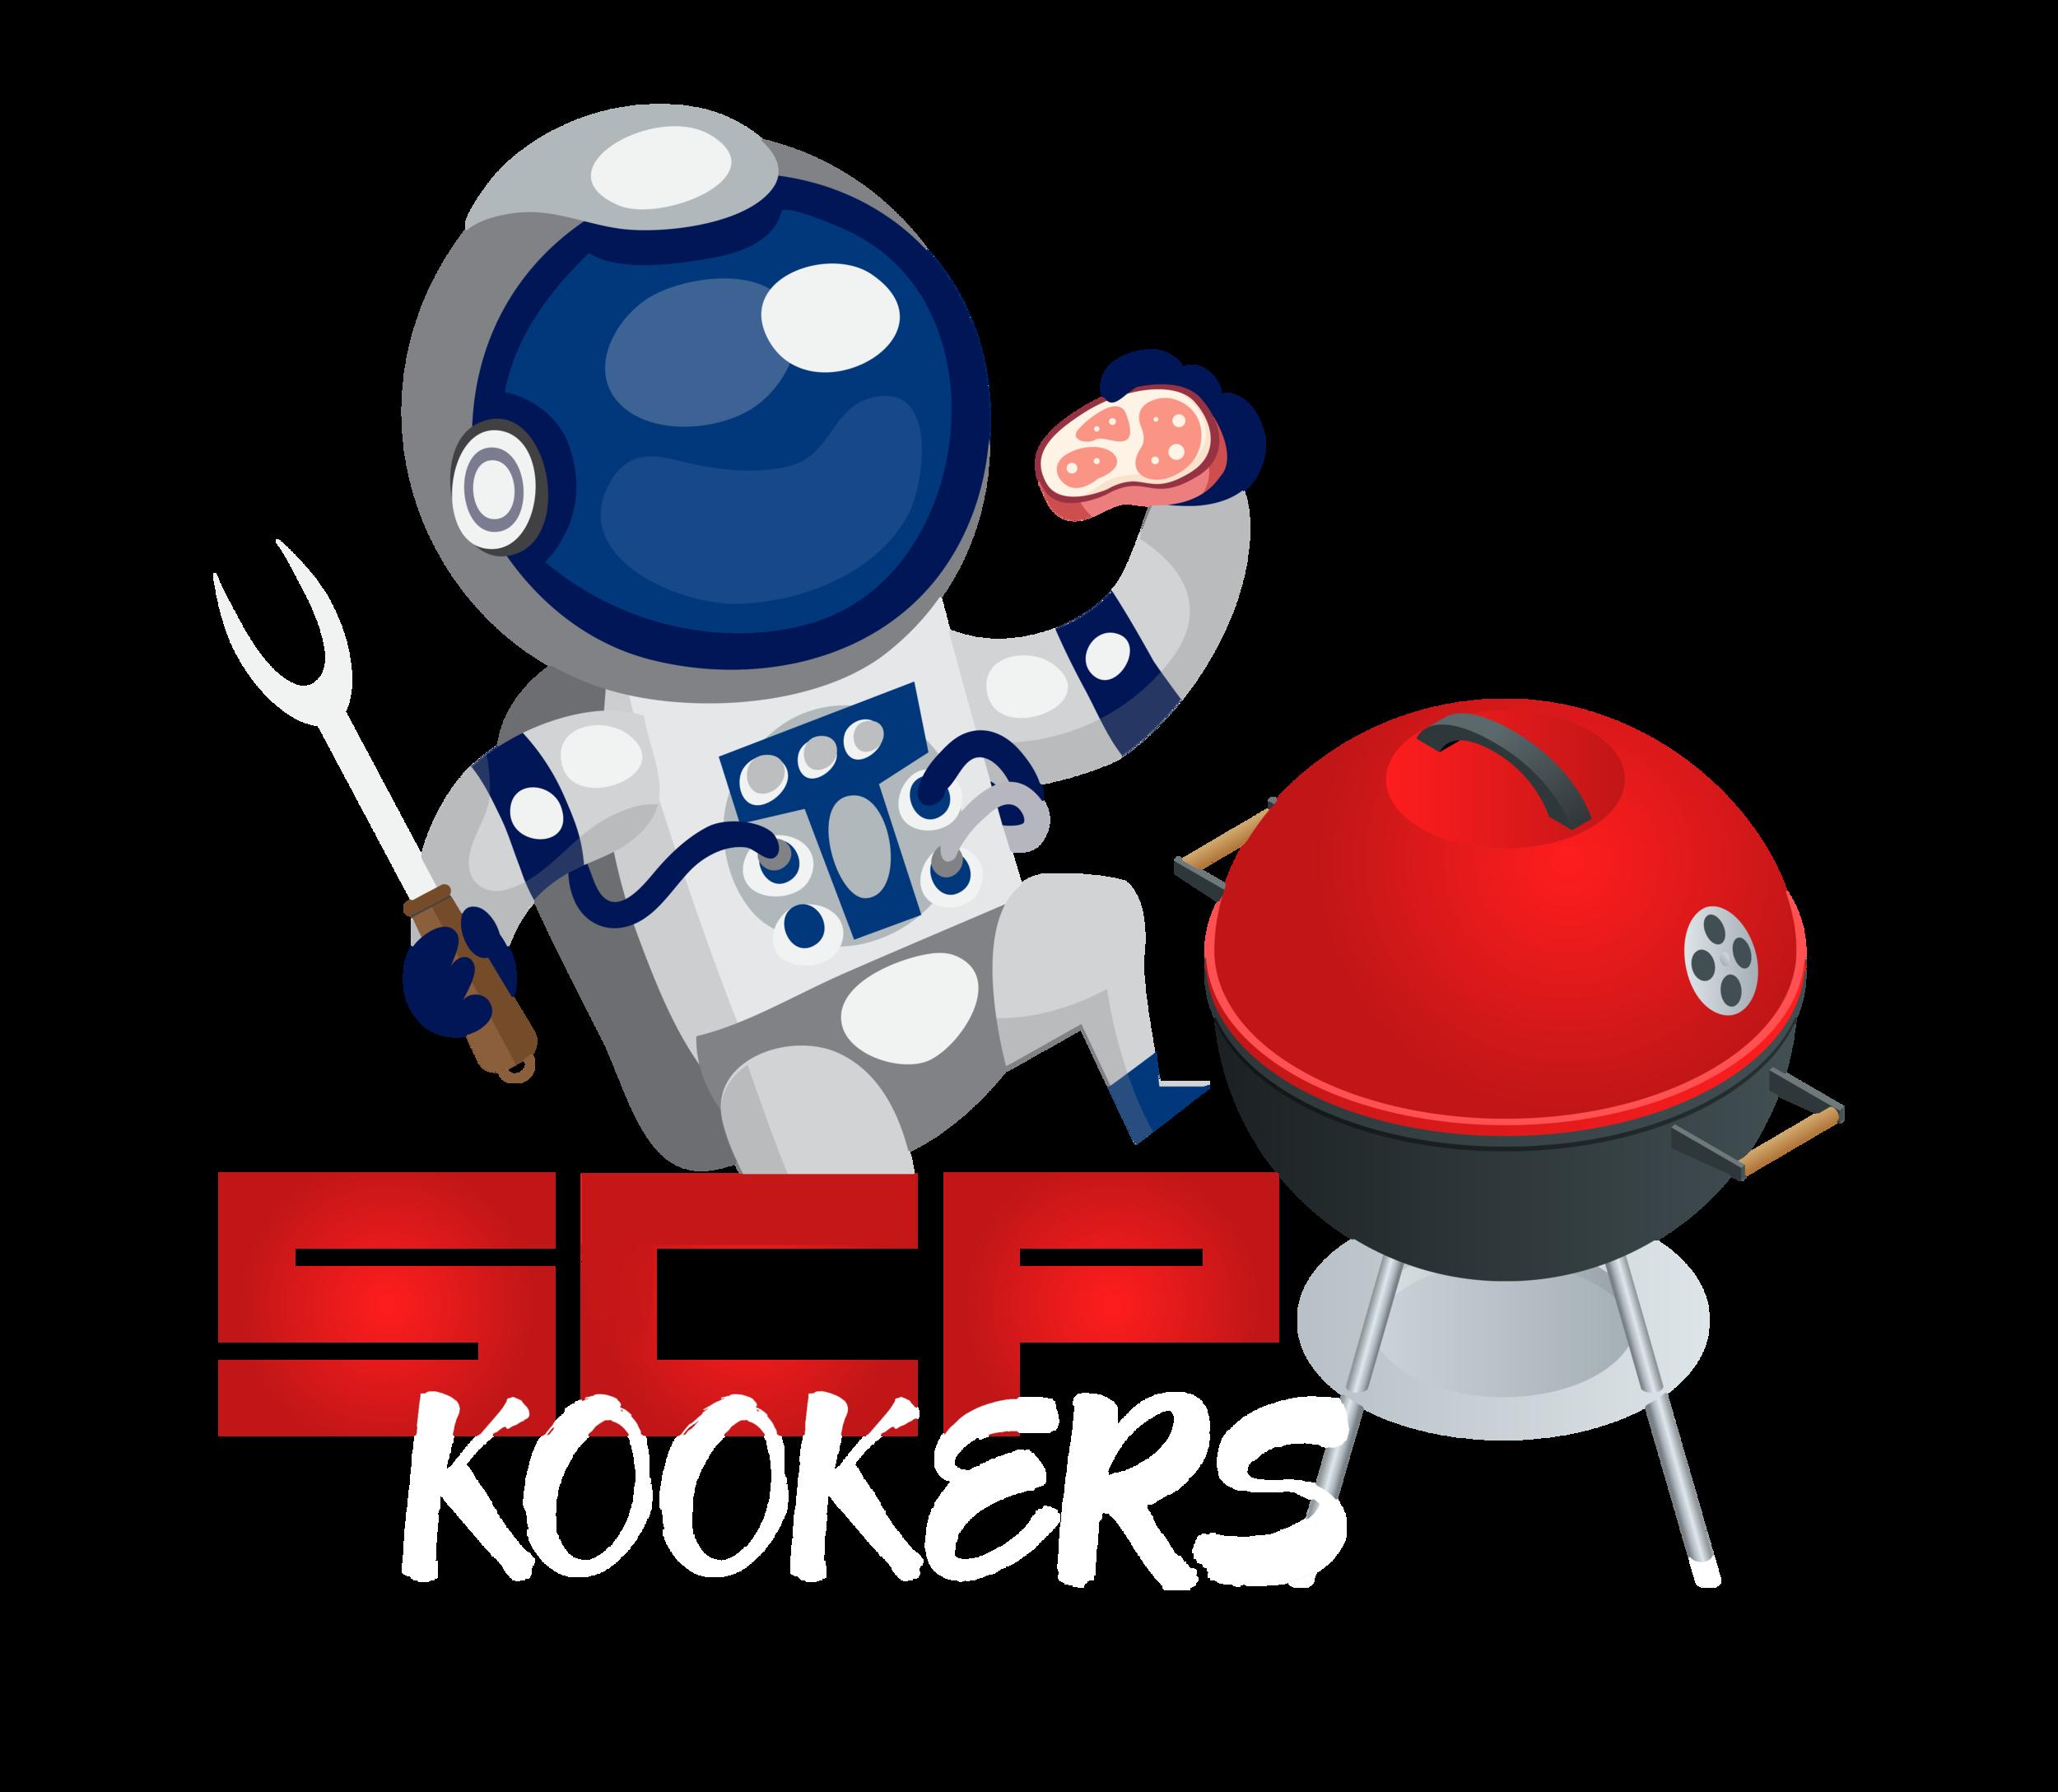 SCP_kookers_logo update.png